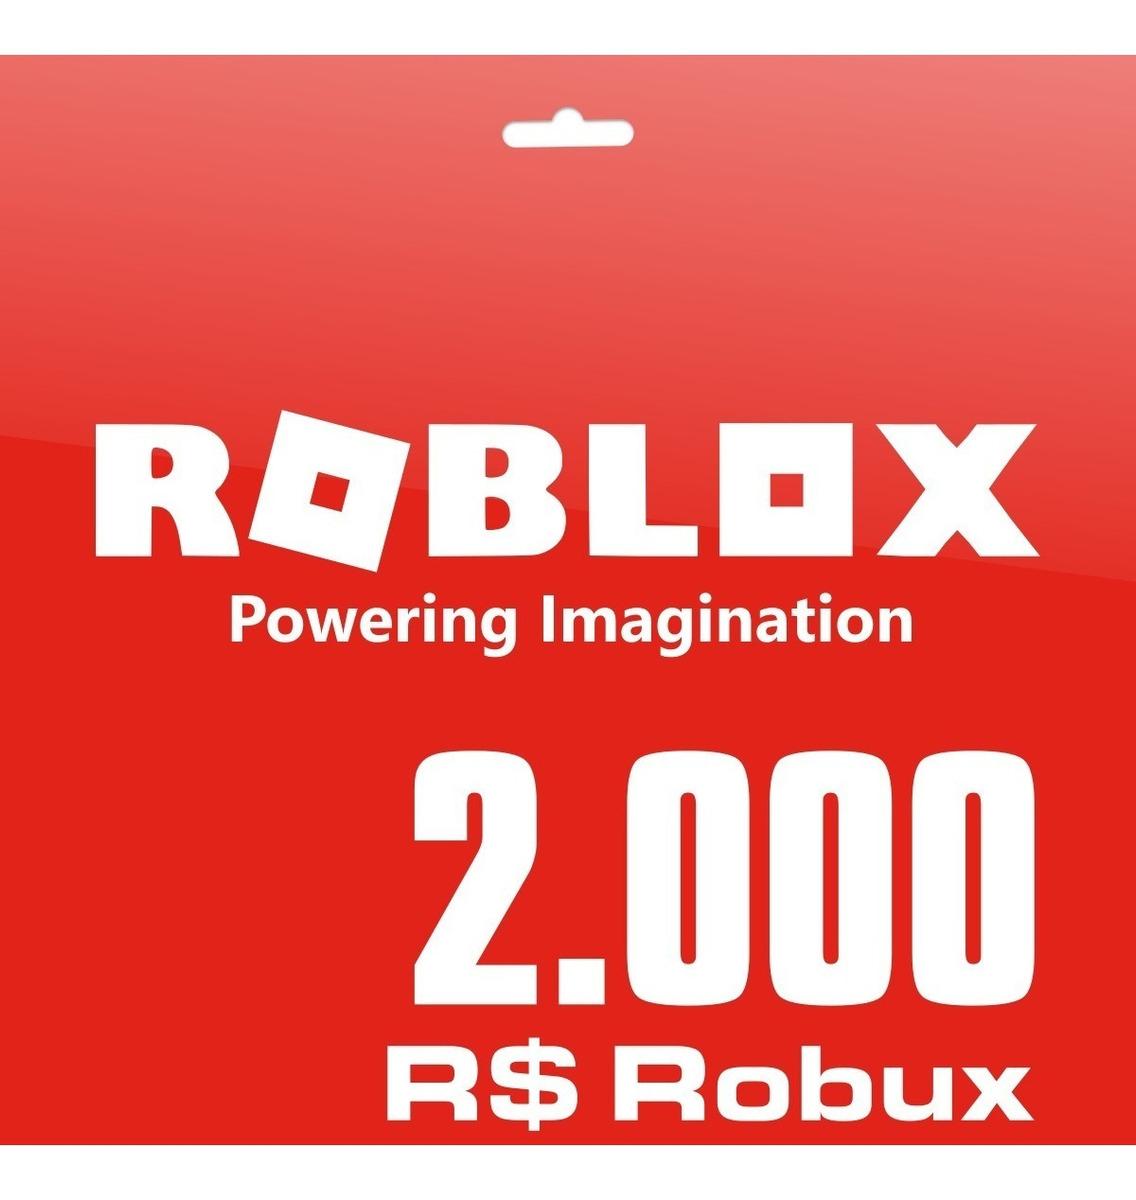 Roblox 2000 Robux Pc Gift Card Entrega Digital Inmediata